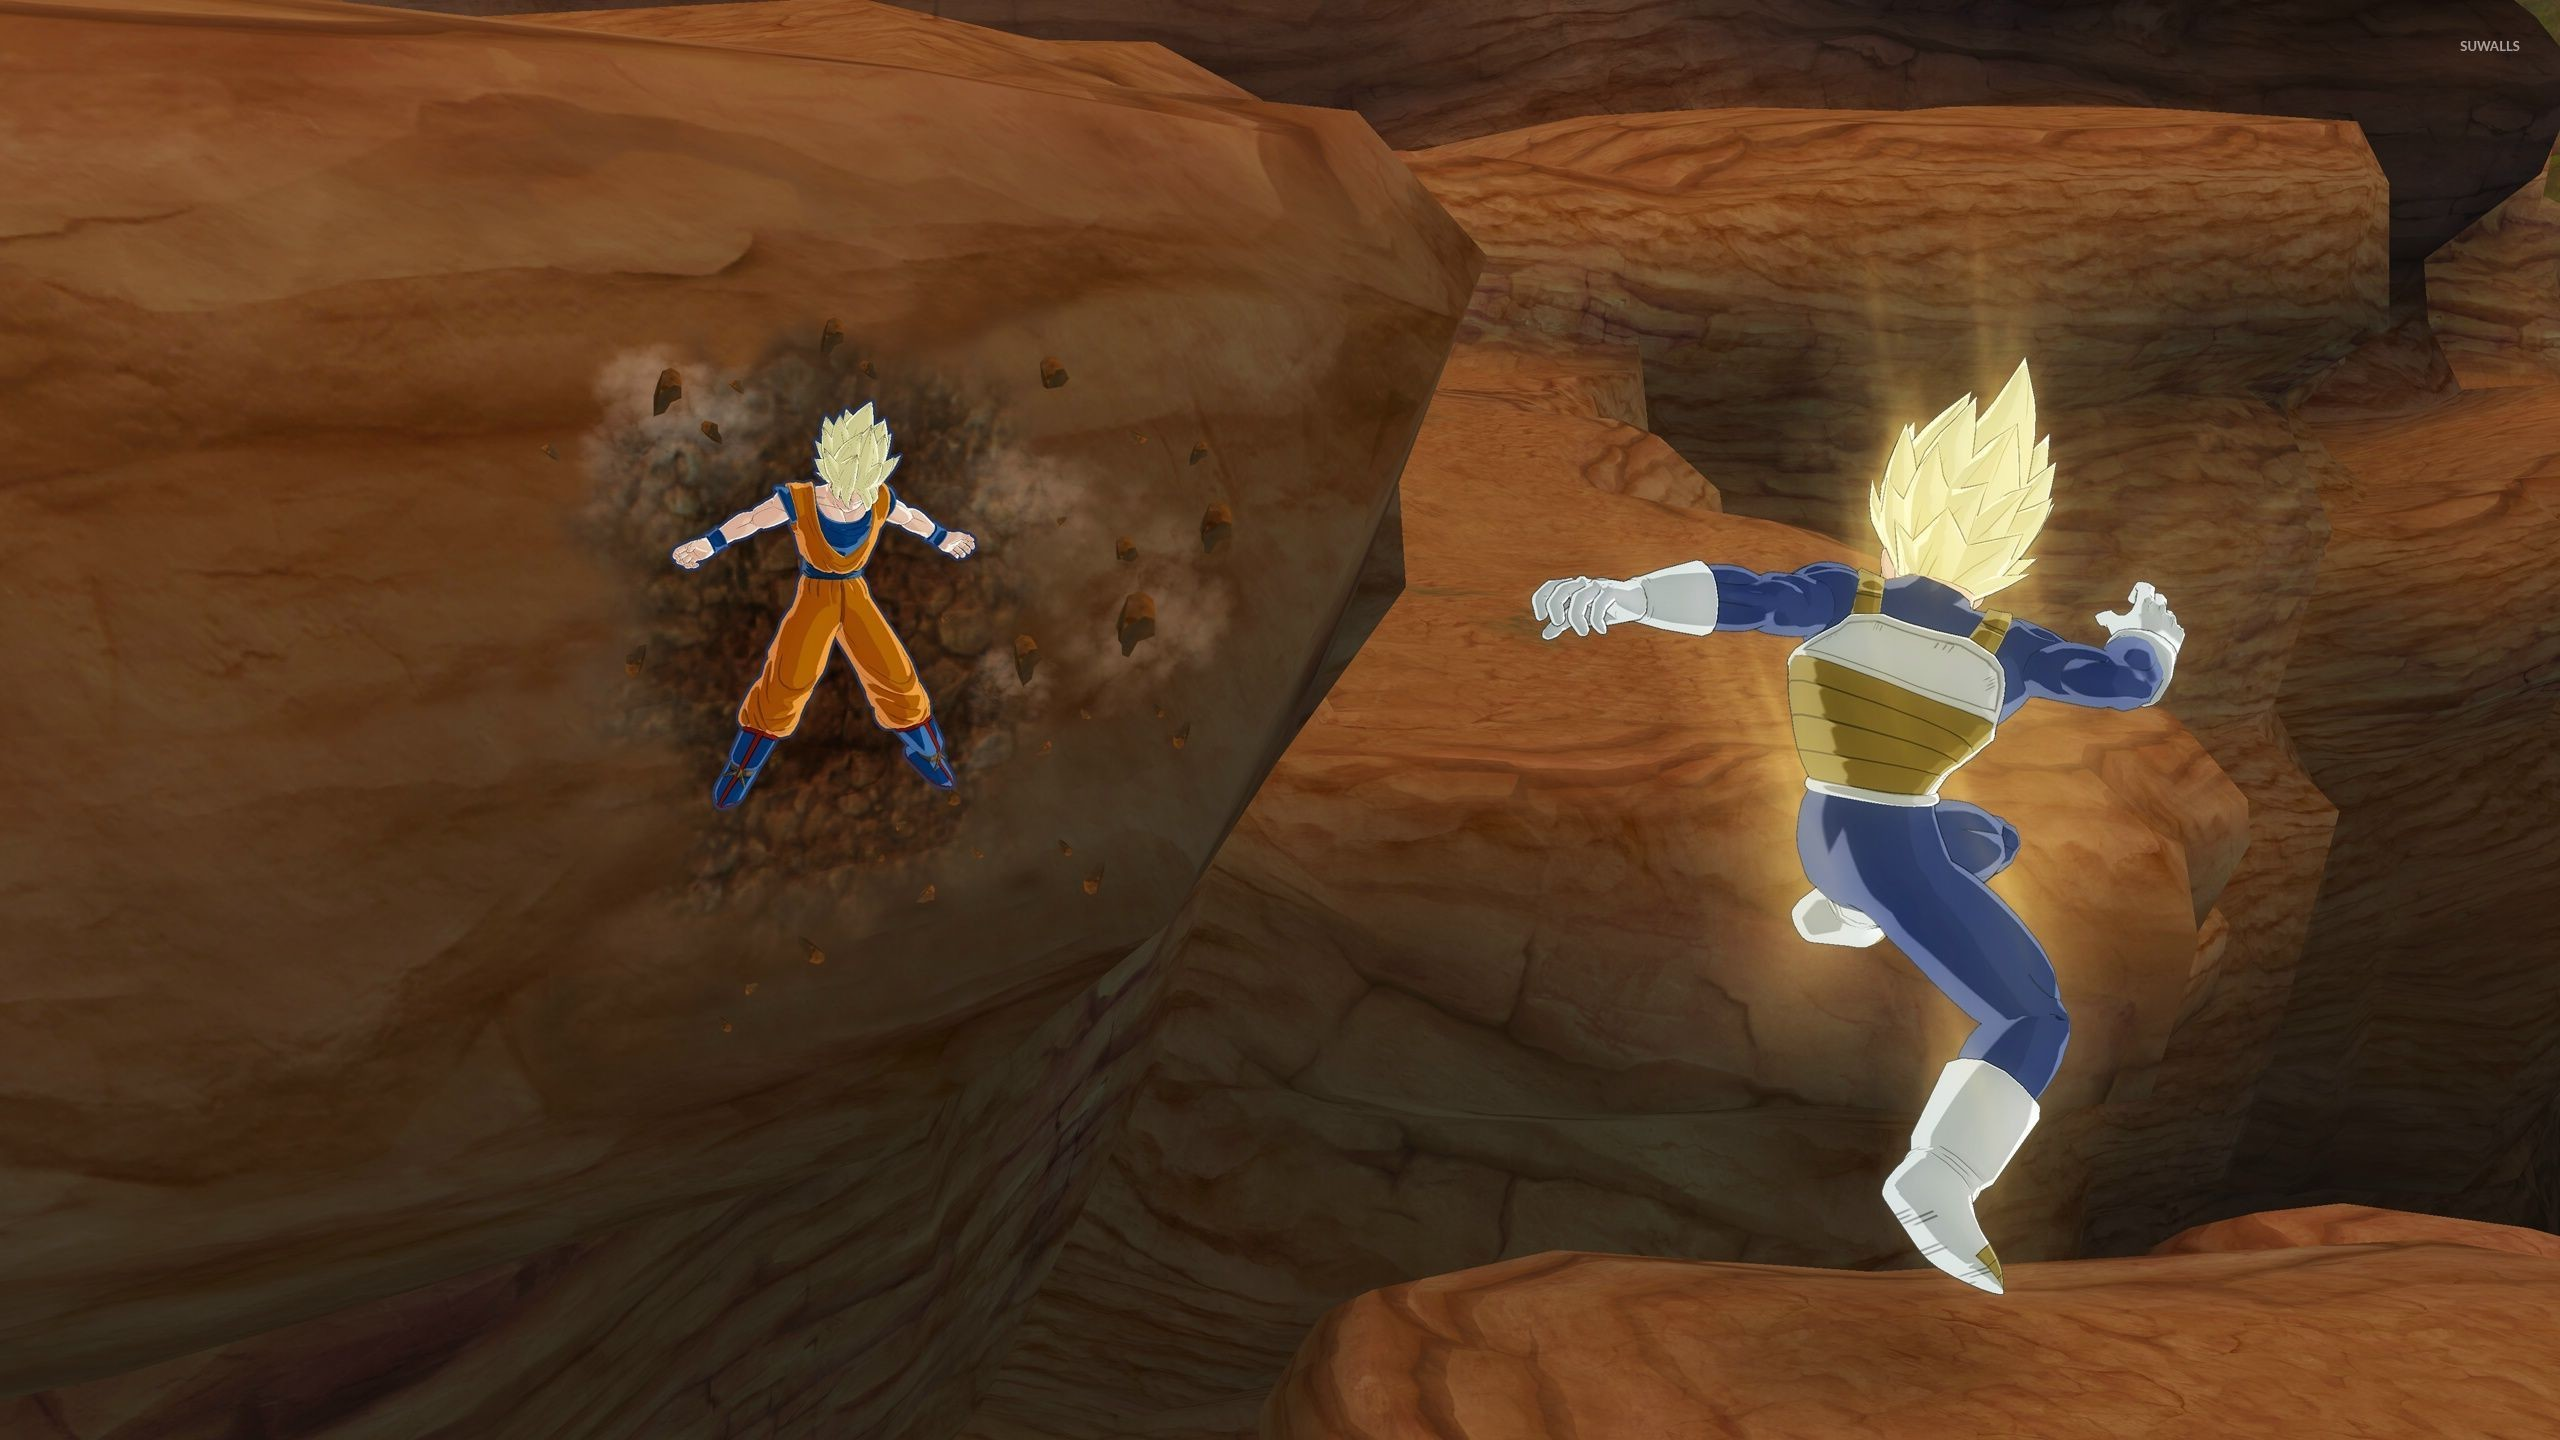 Vegeta vs Goku in Dragon Ball Z wallpaper jpg